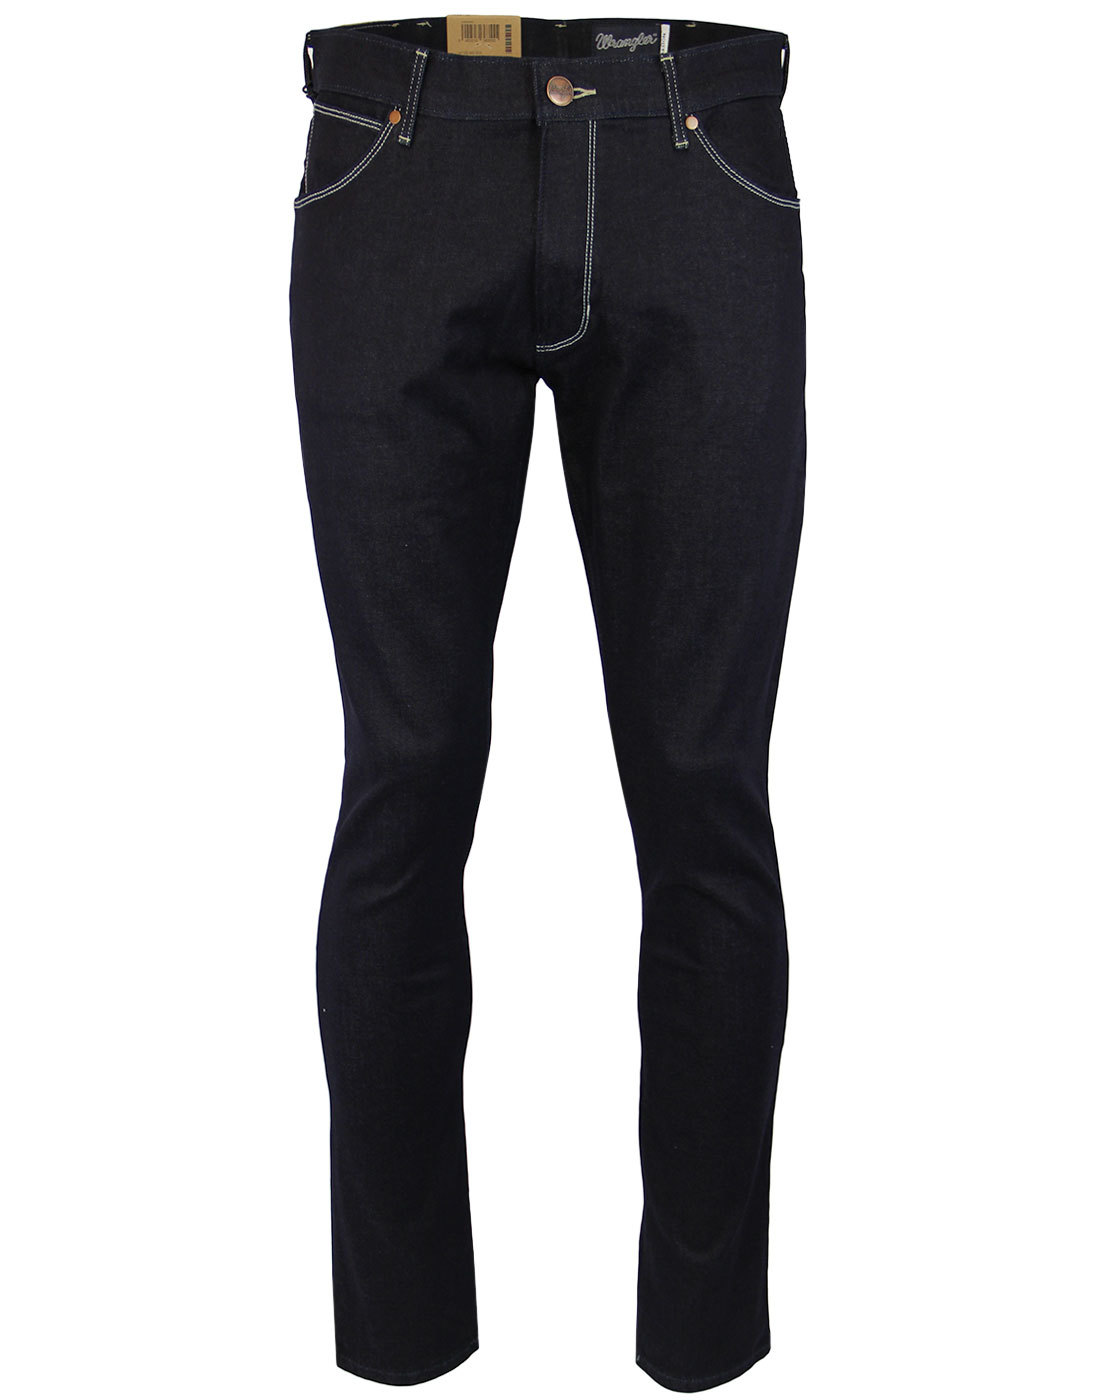 Larston WRANGLER Slim Tapered Luxe Denim Jeans